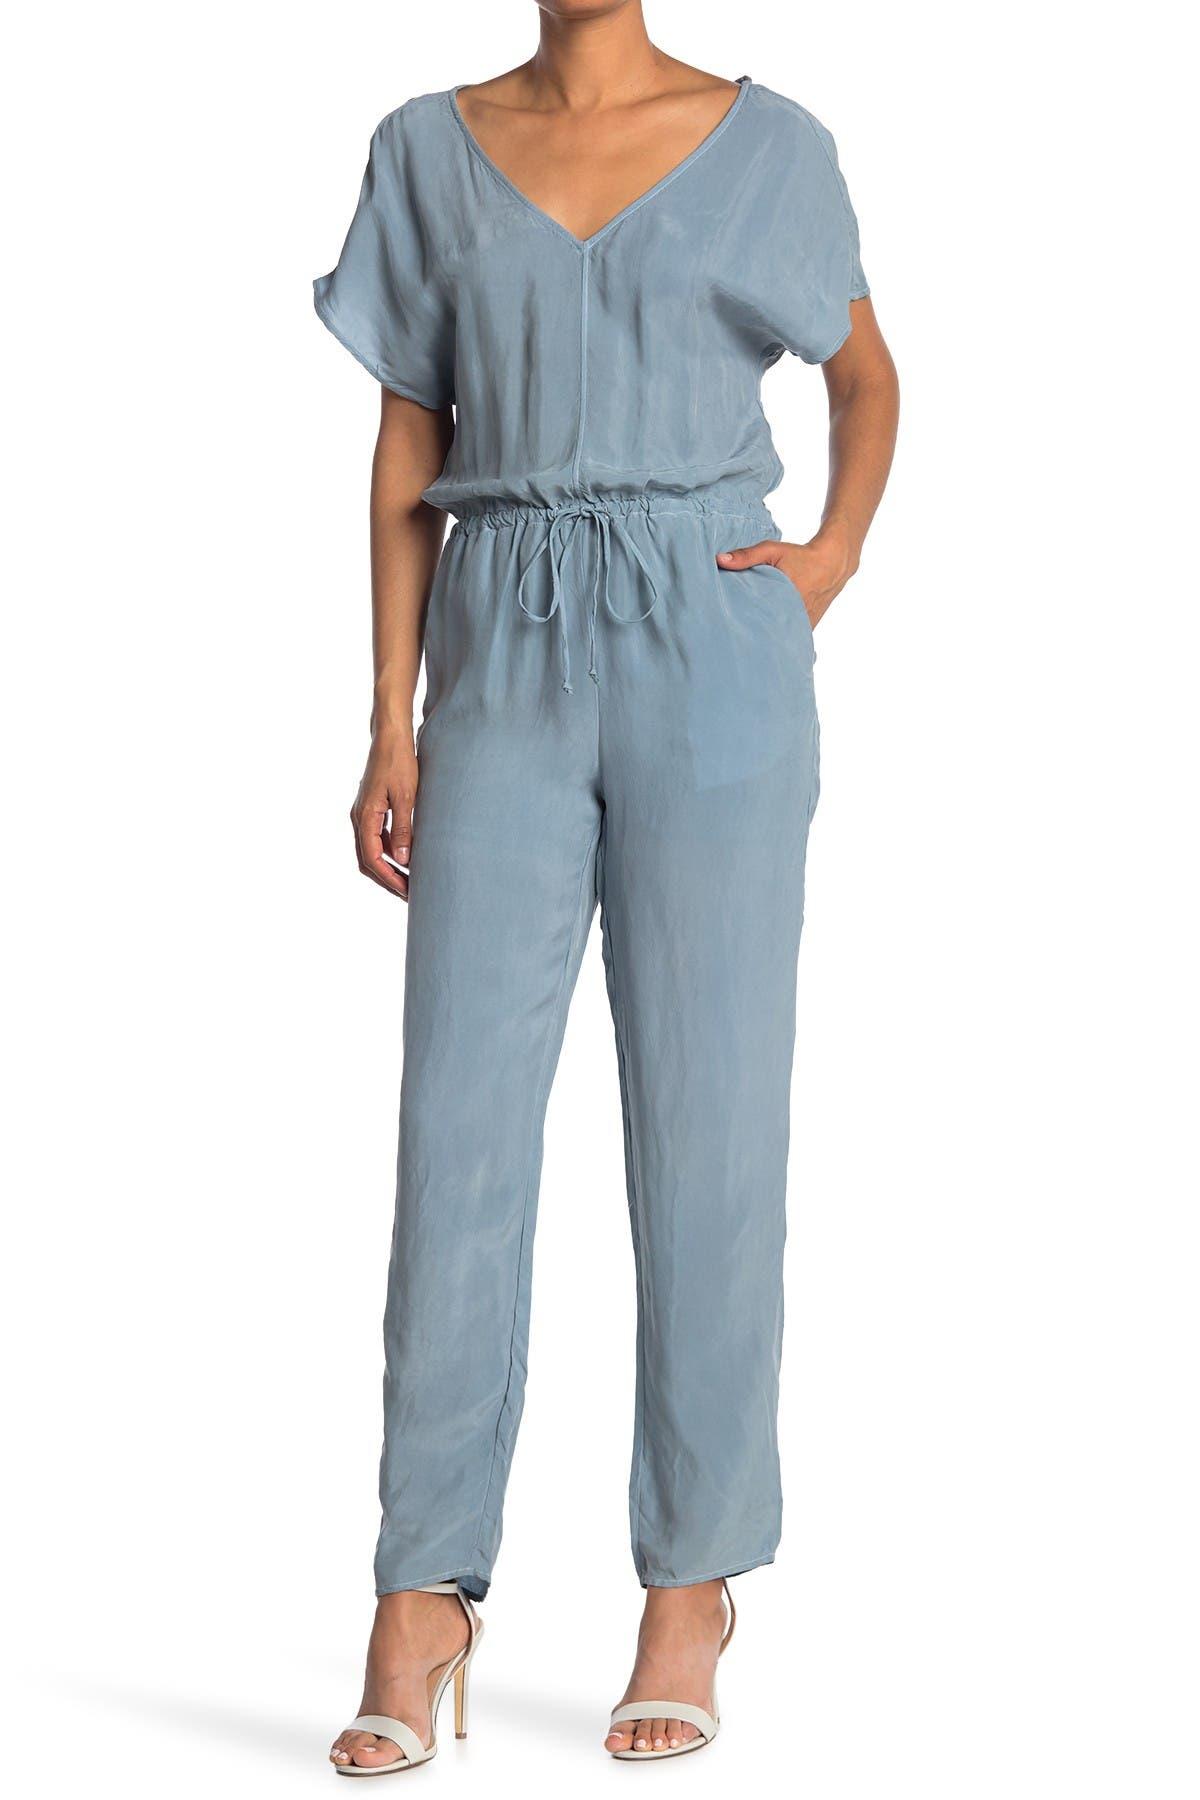 Image of Stateside Cupro Short Sleeve Jumpsuit